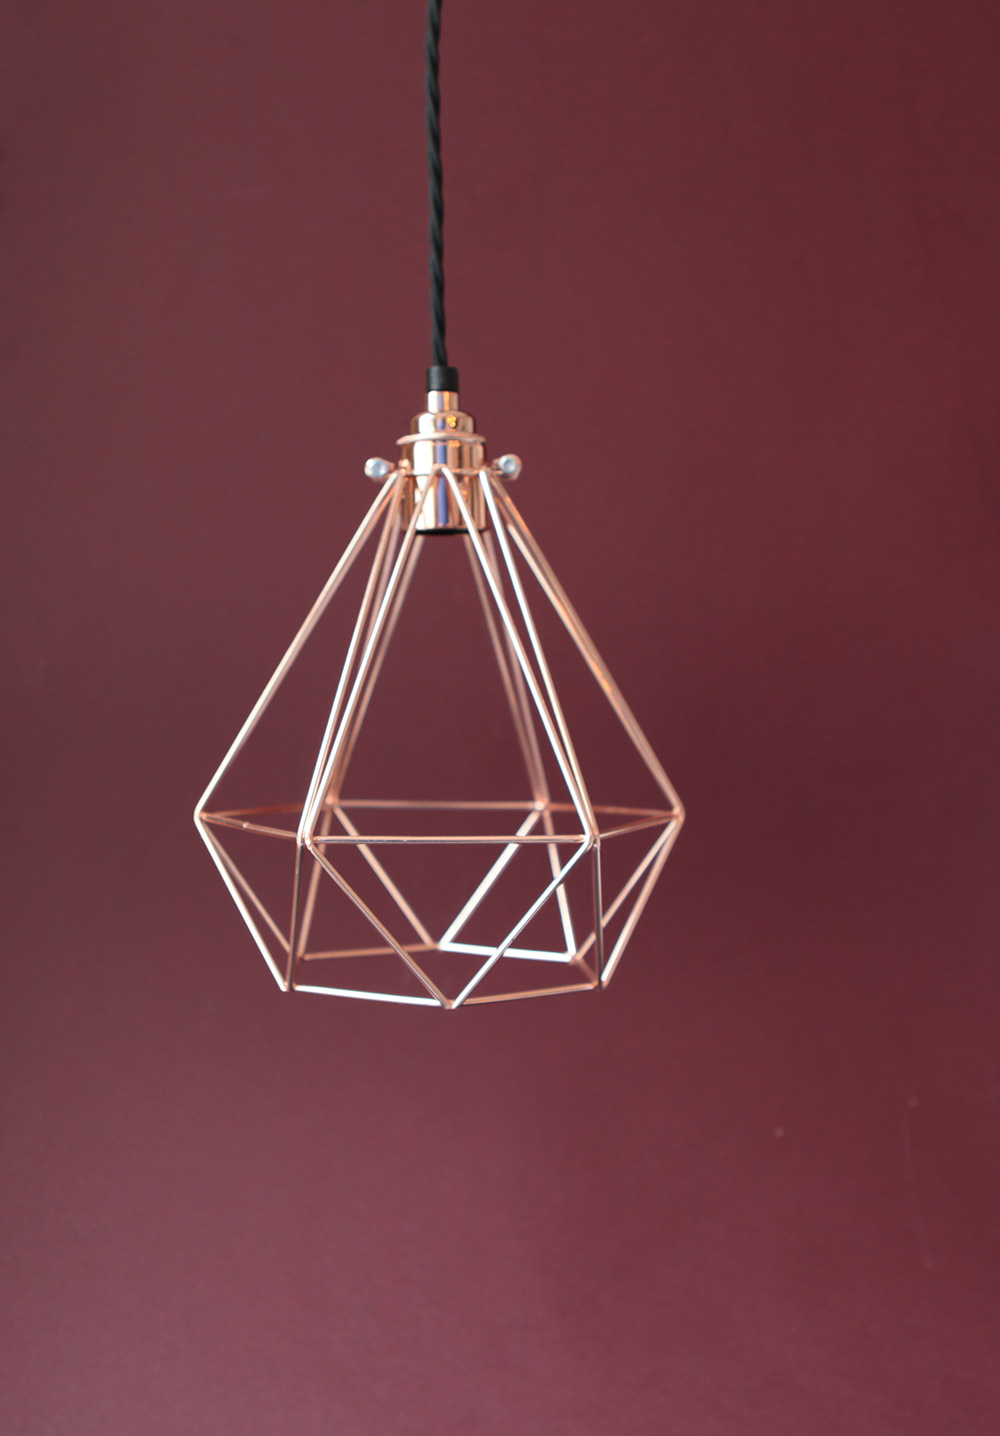 copper light cage marsala background